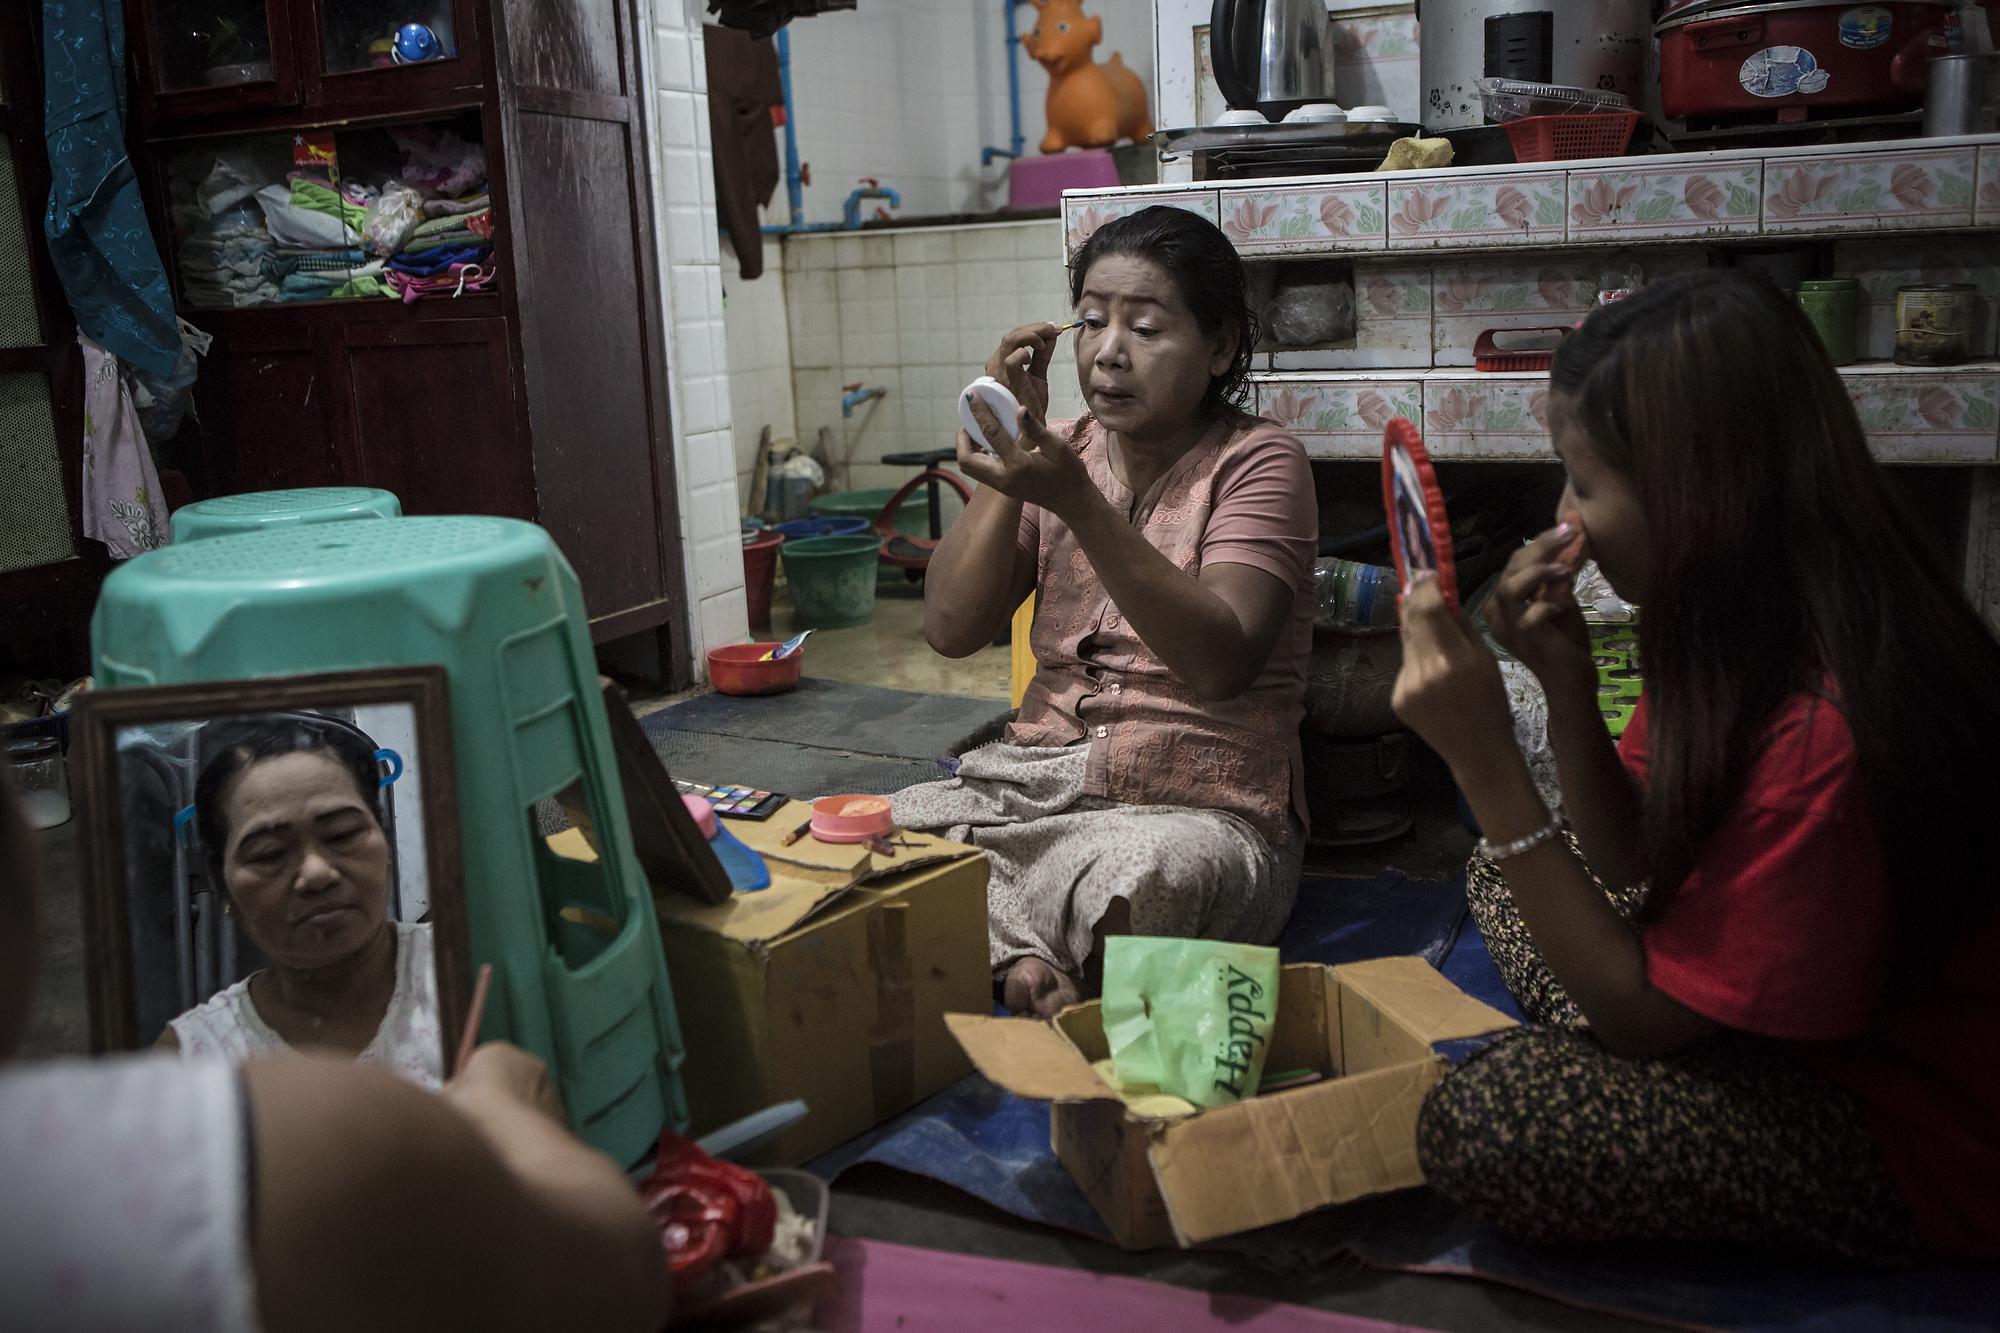 MW_Myanmar_Moustache_Brothers_1455_edit.jpg